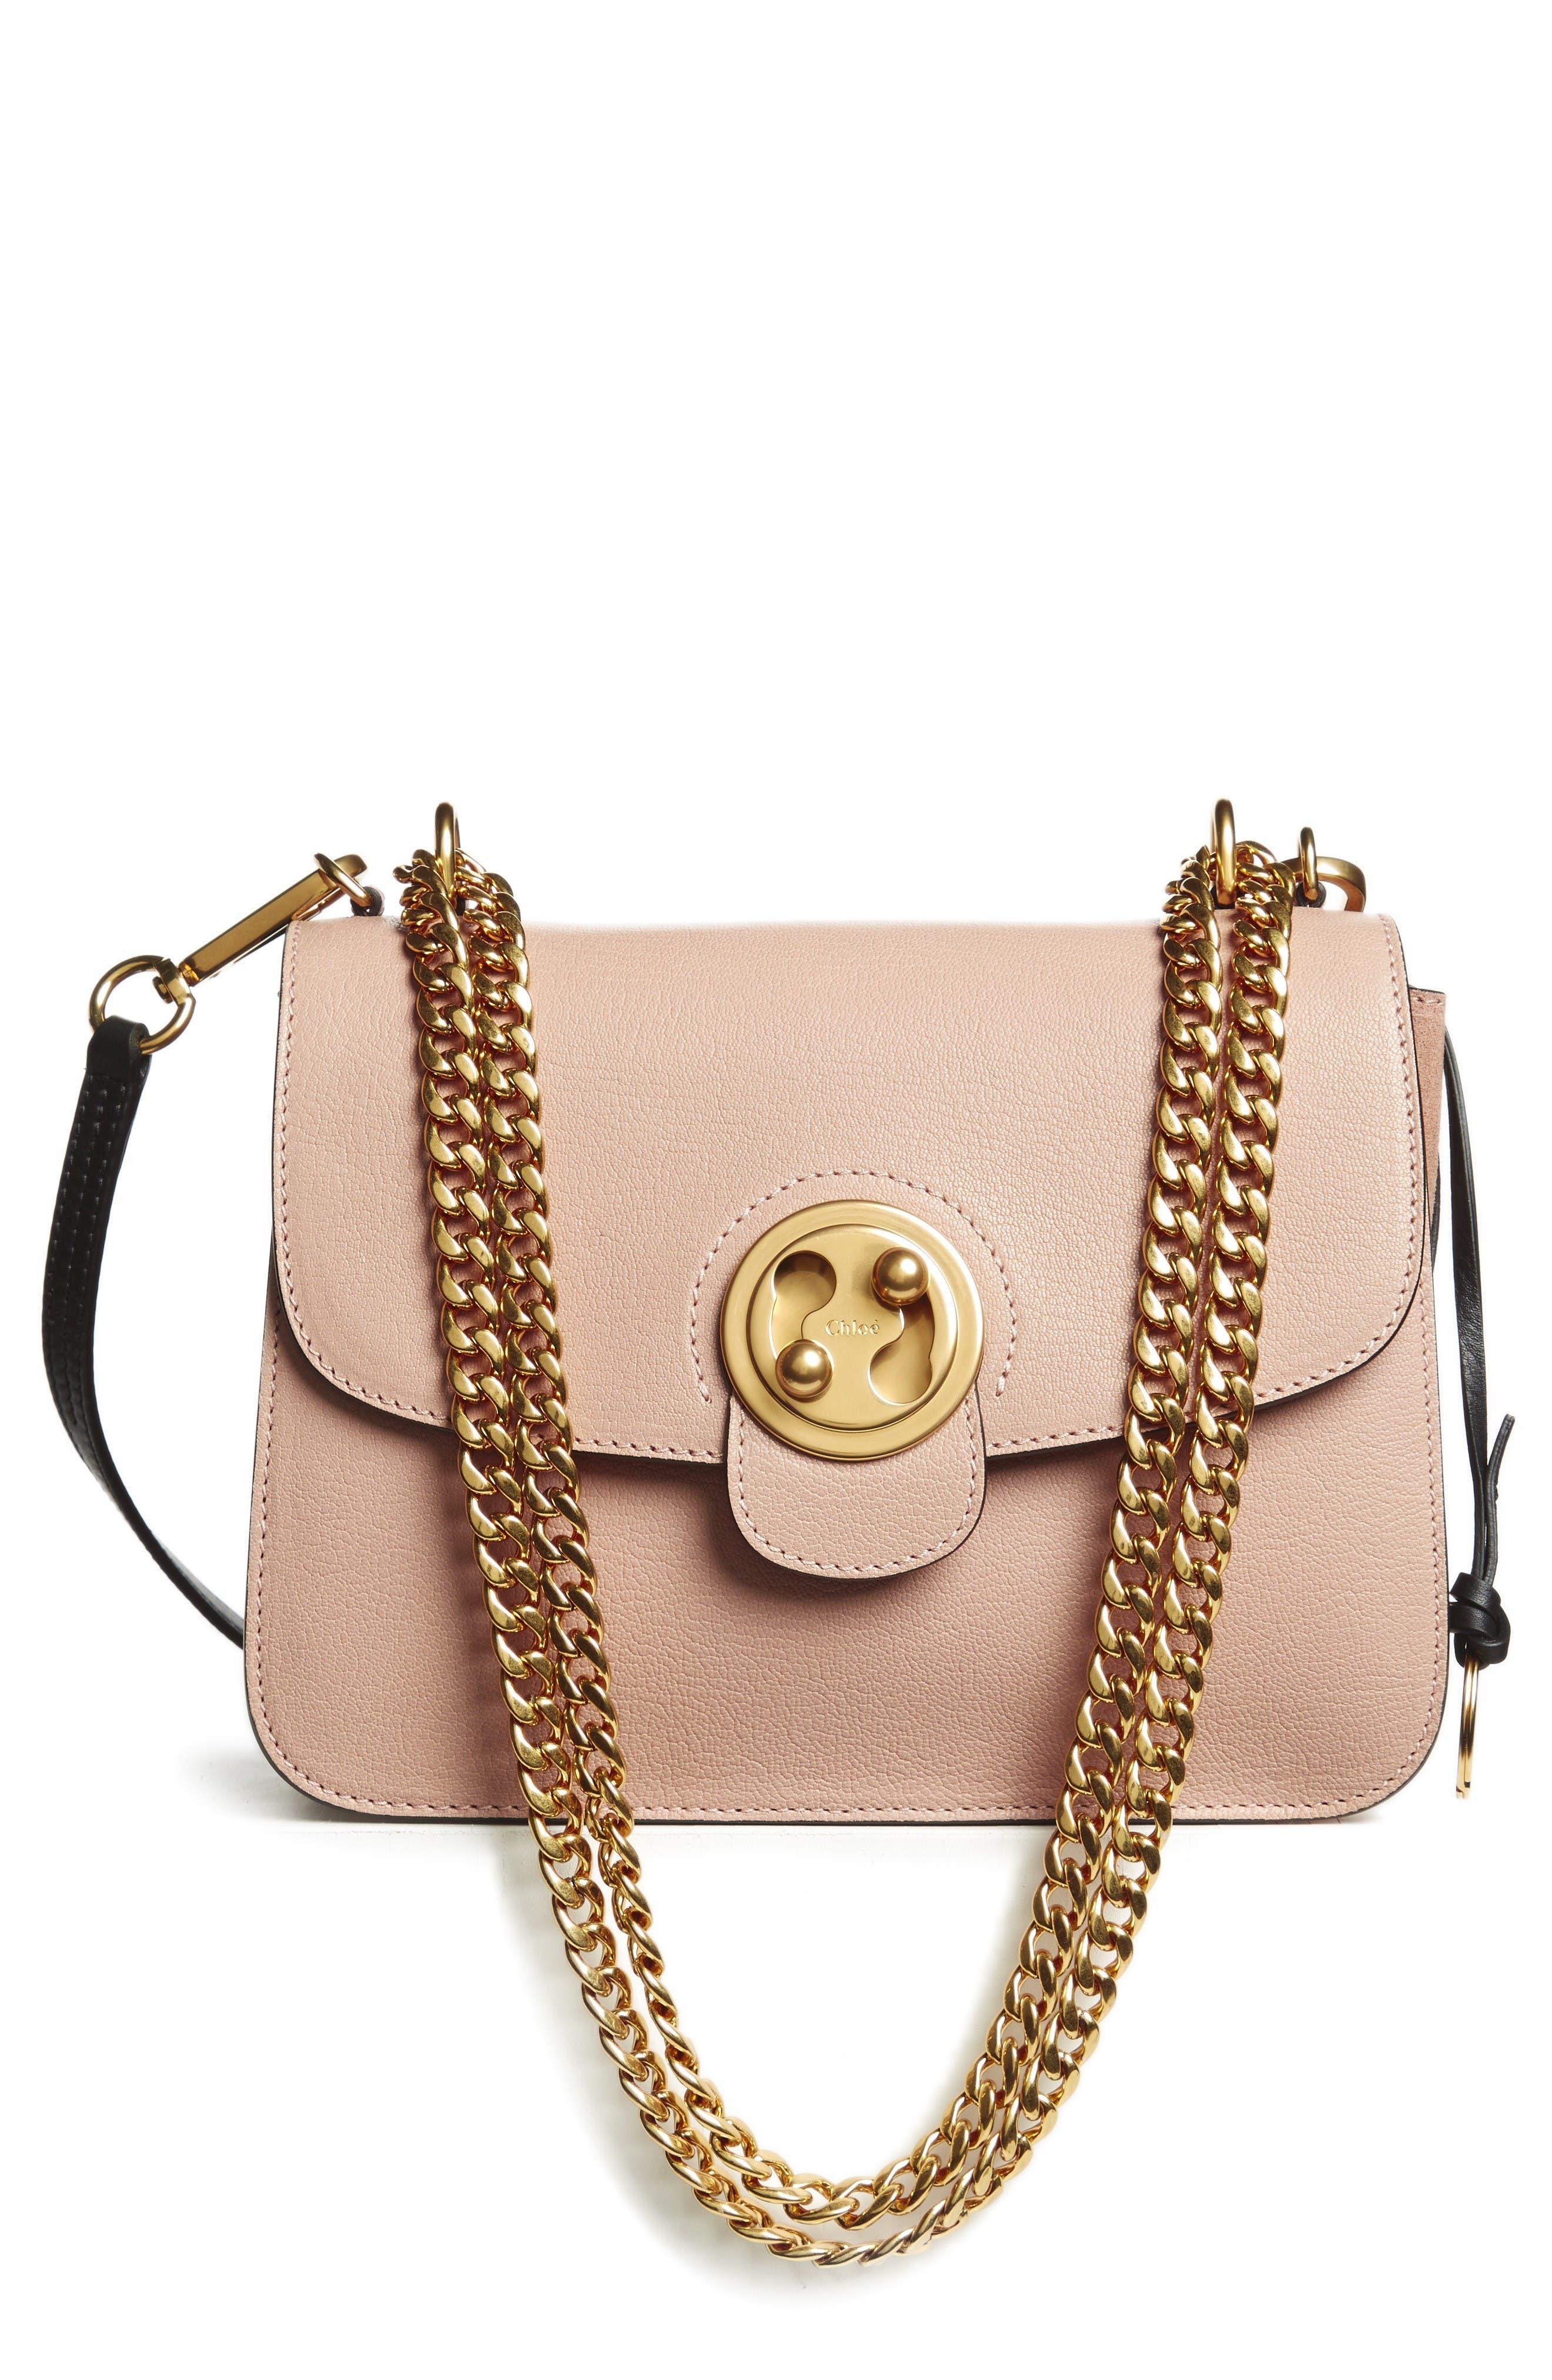 Chloé Medium Mily Leather Shoulder Bag